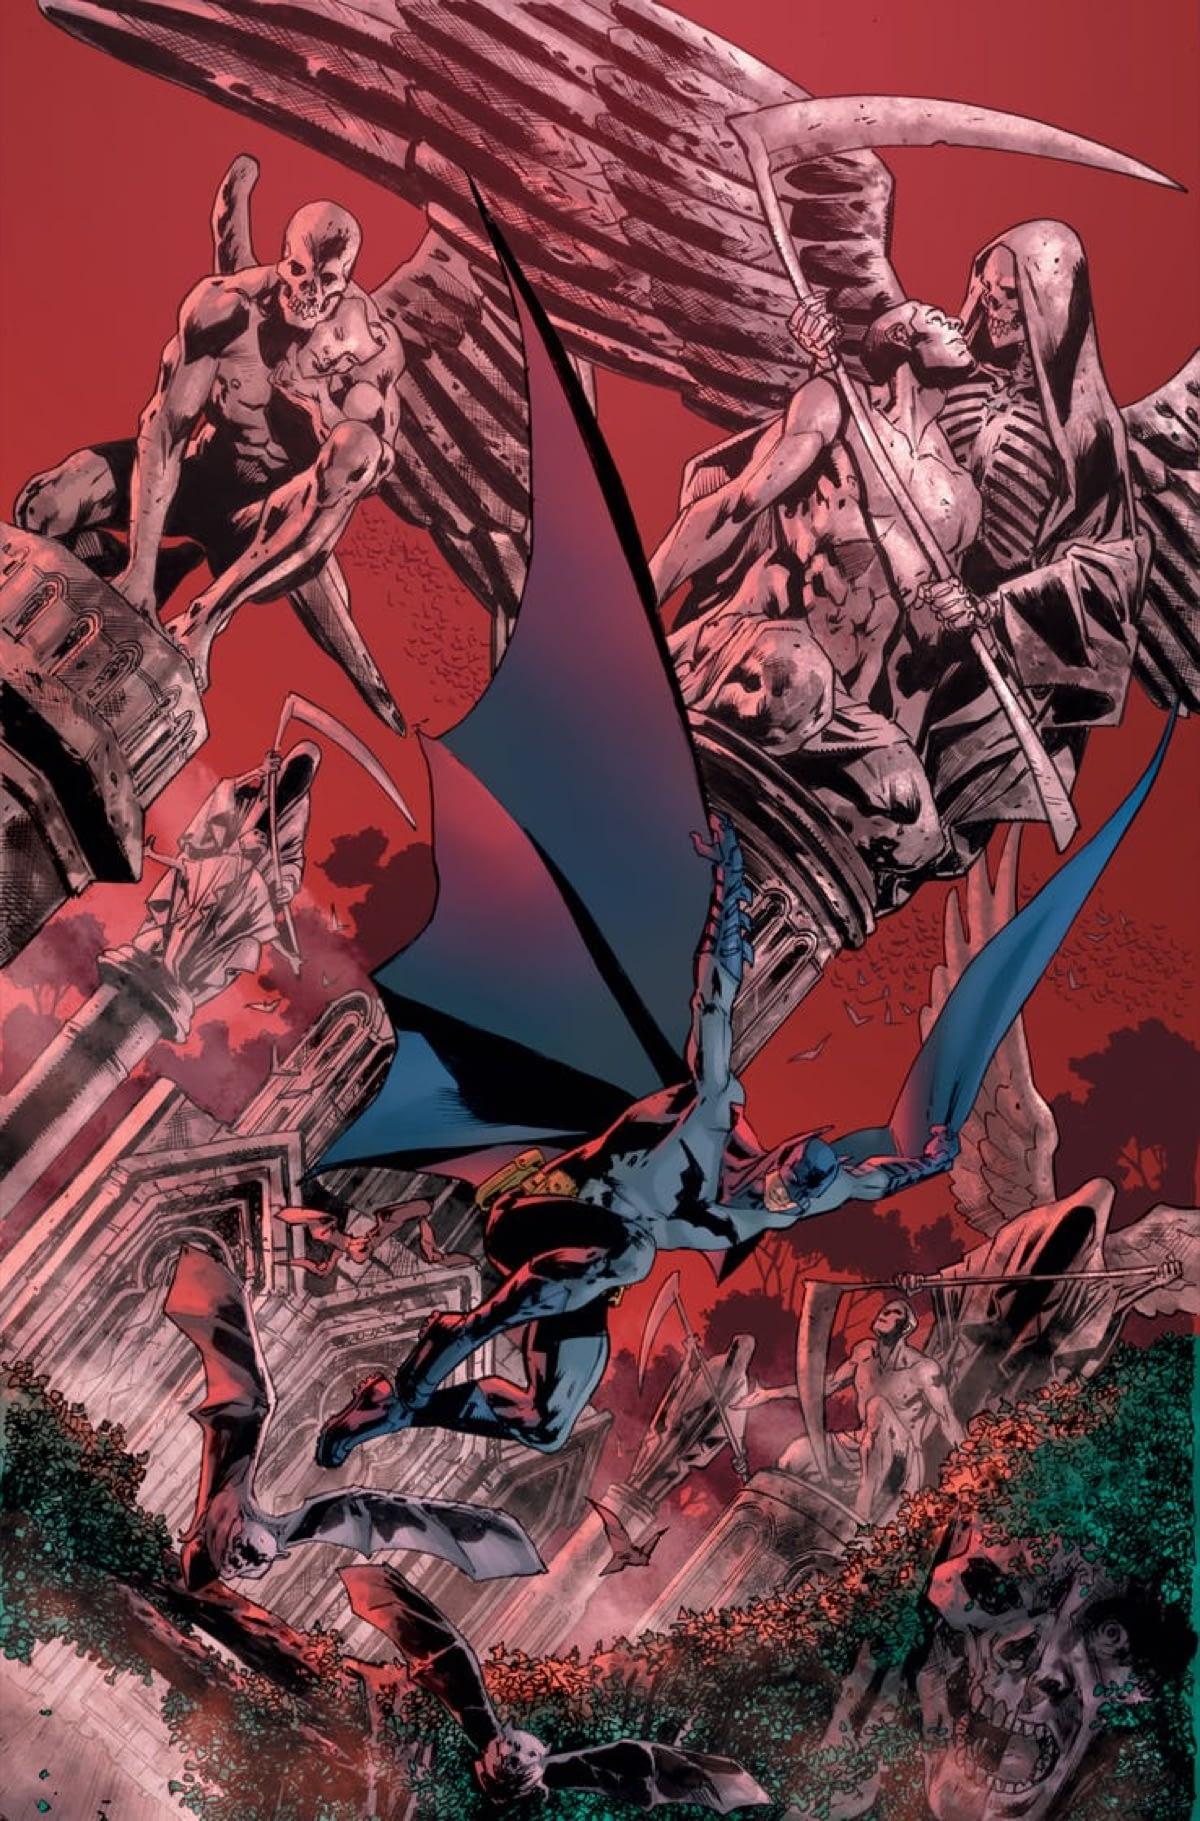 Batman's Grave: Warren Ellis and Bryan Hitch Series Launches in October